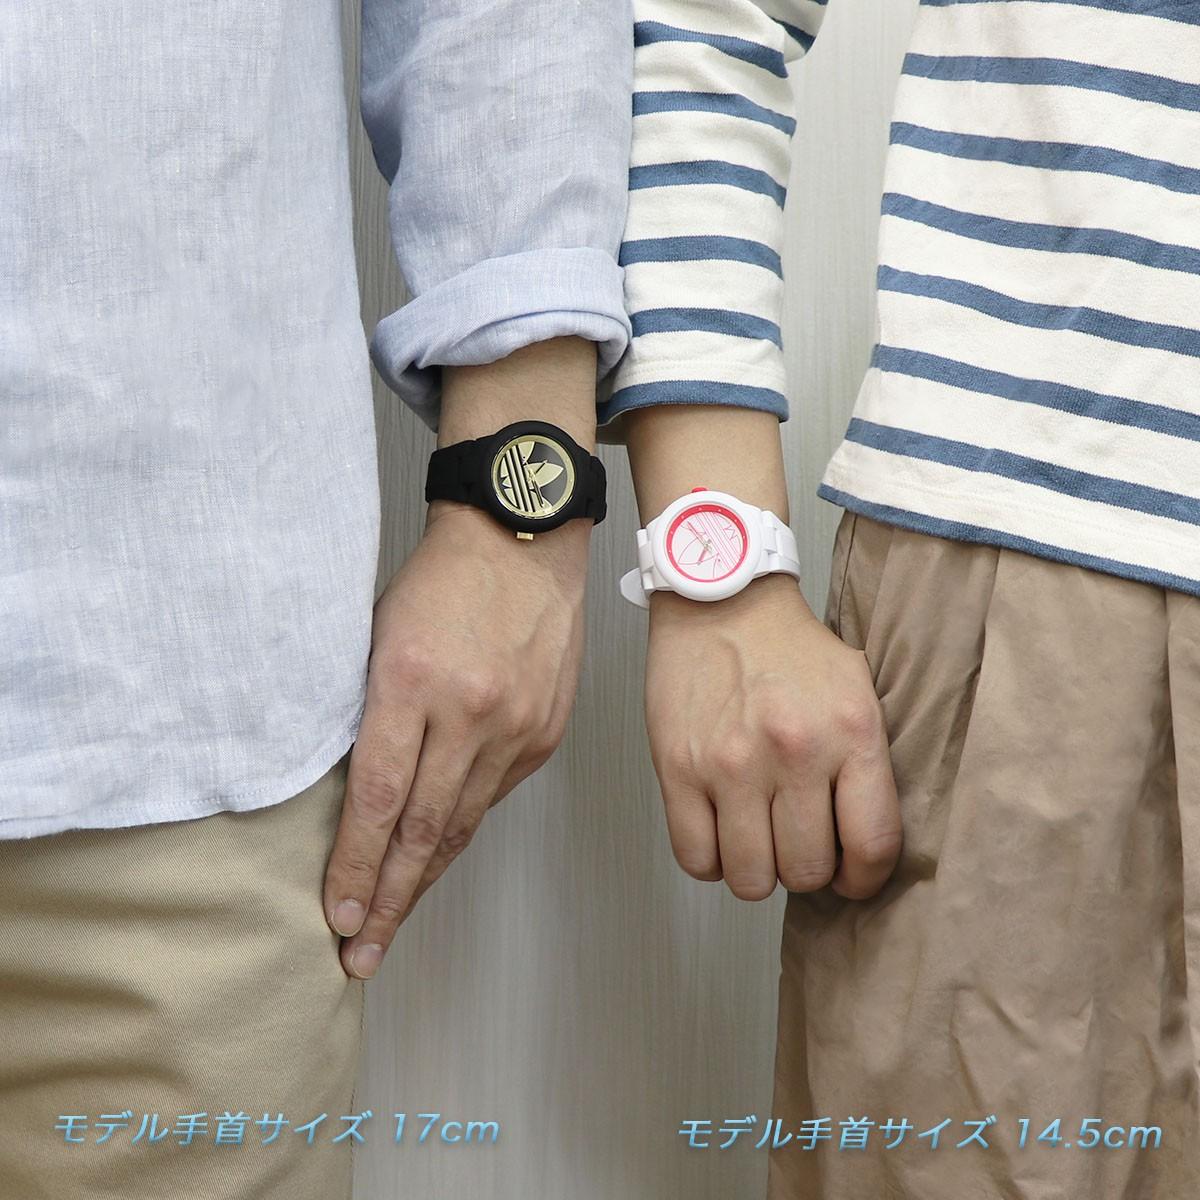 ADIDAS adidas アディダス 腕時計 人気 防水 スポーツ ウォッチ 通販 送料無料